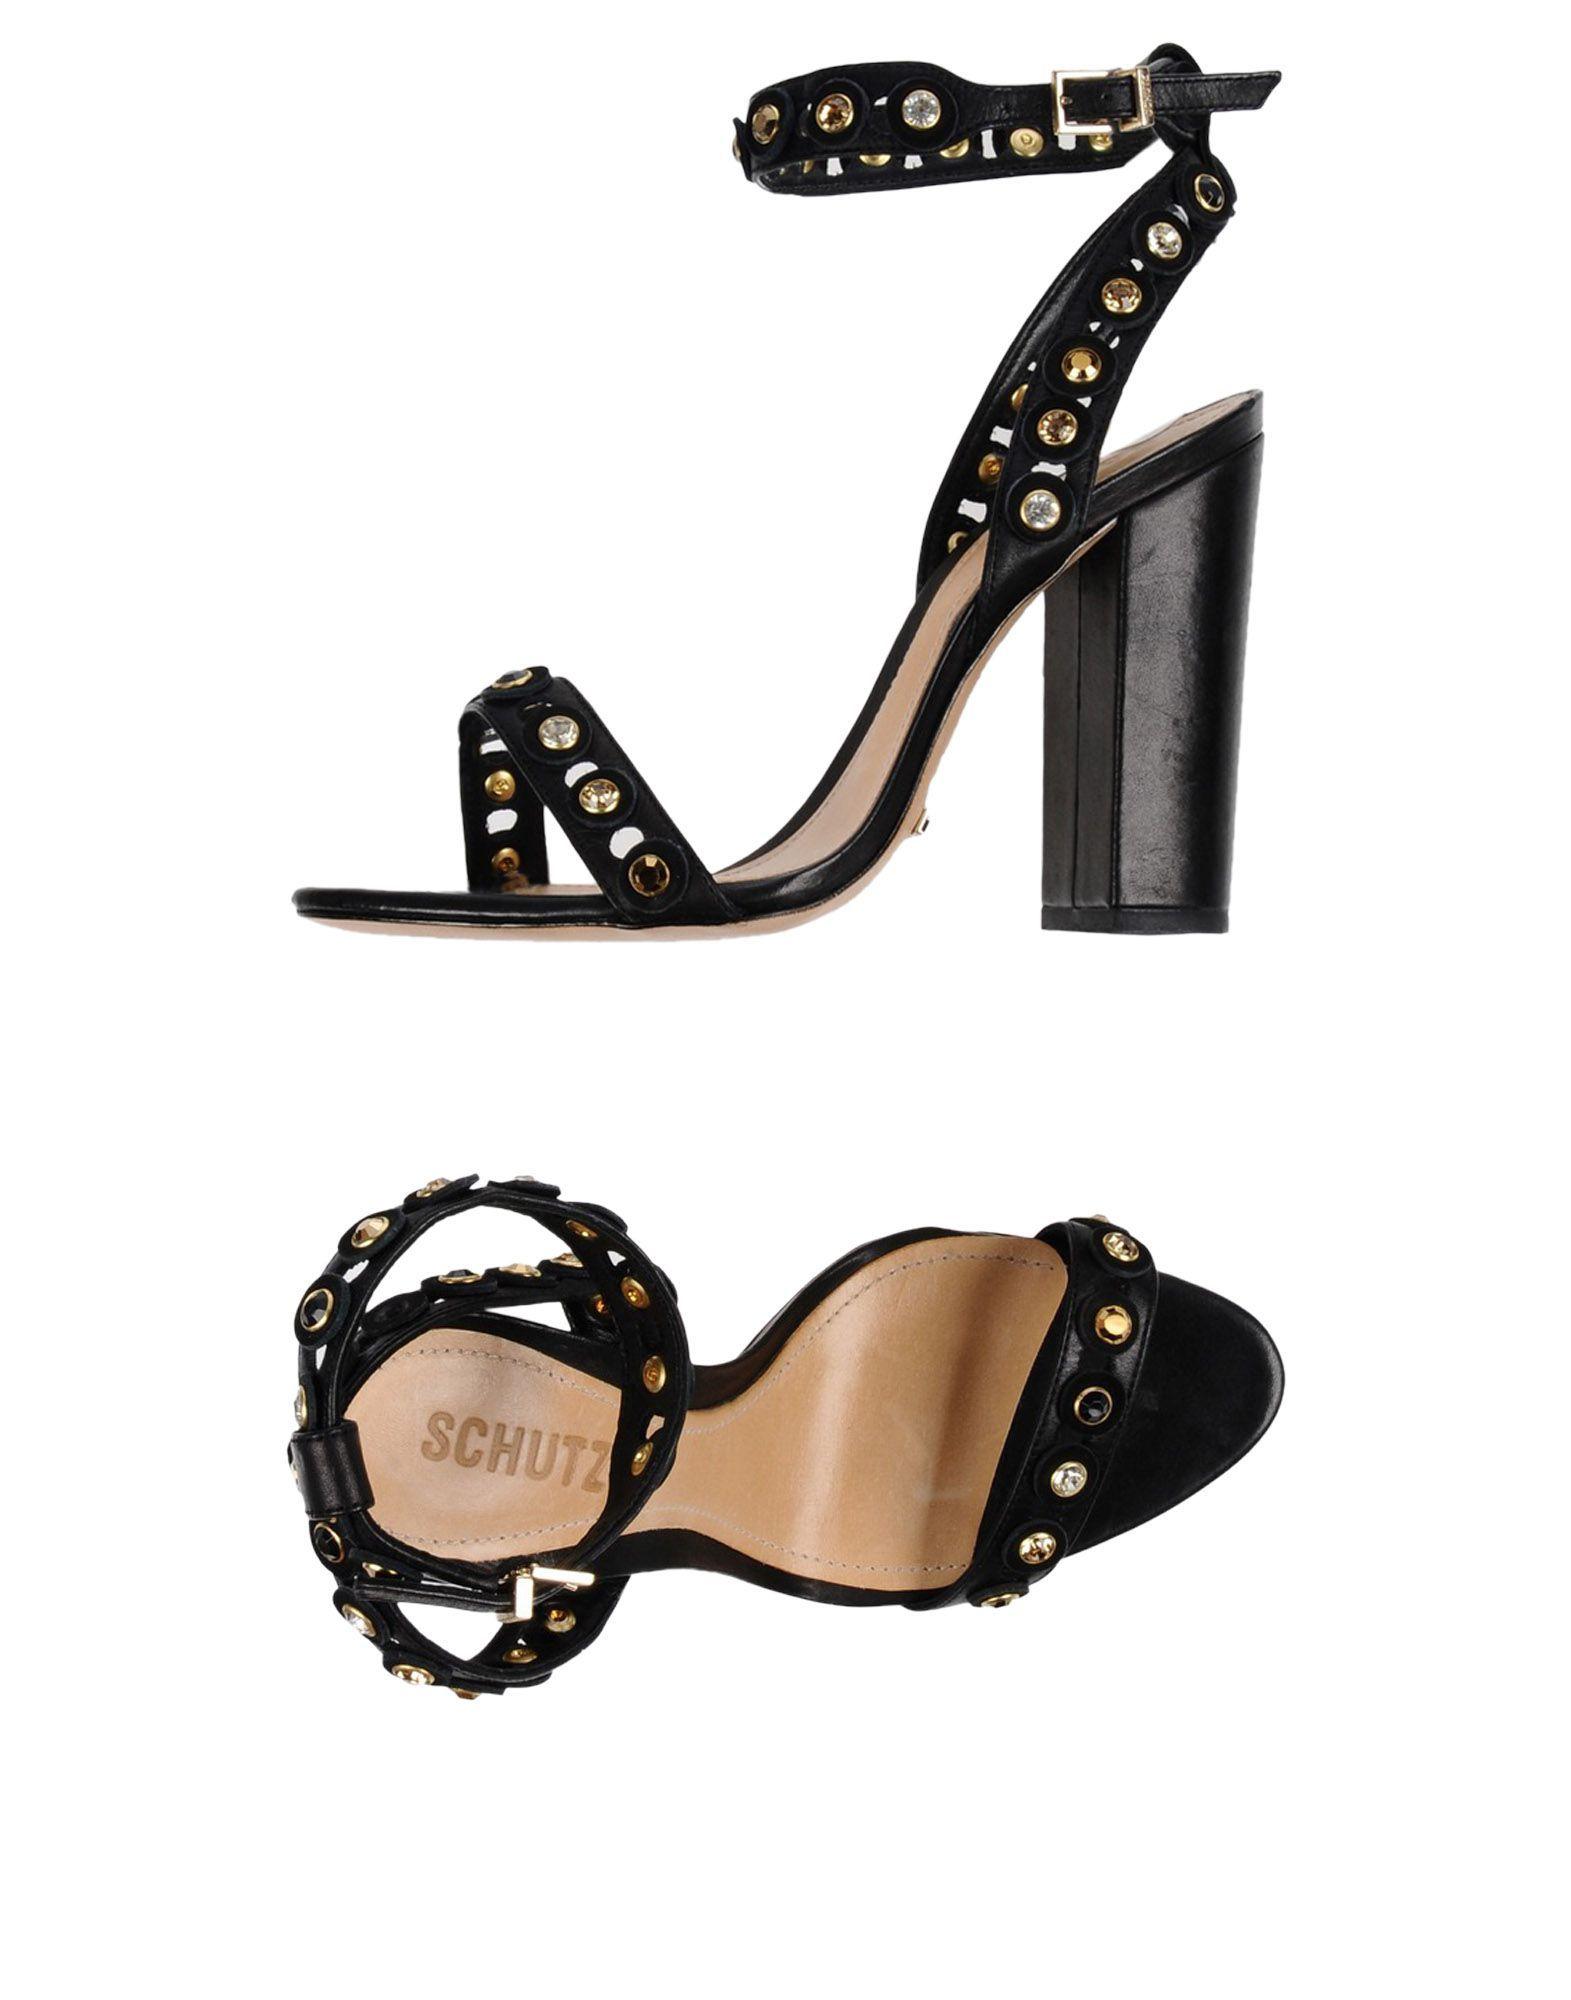 Schutz Black Leather Studded Heels